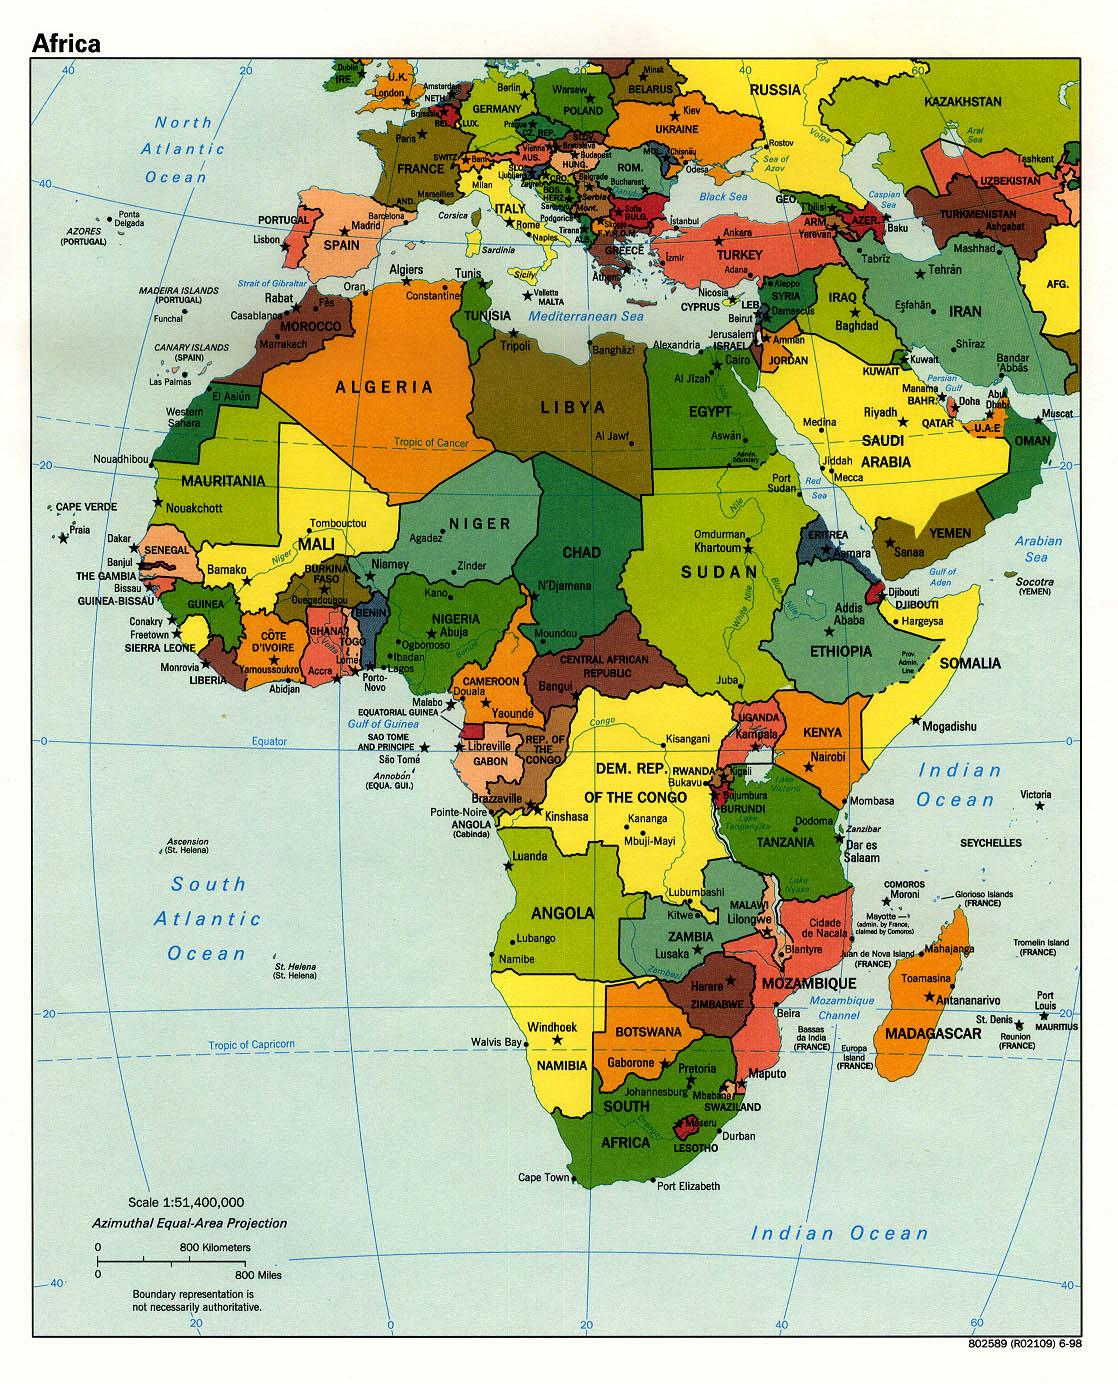 África (http://www.lib.utexas.edu)